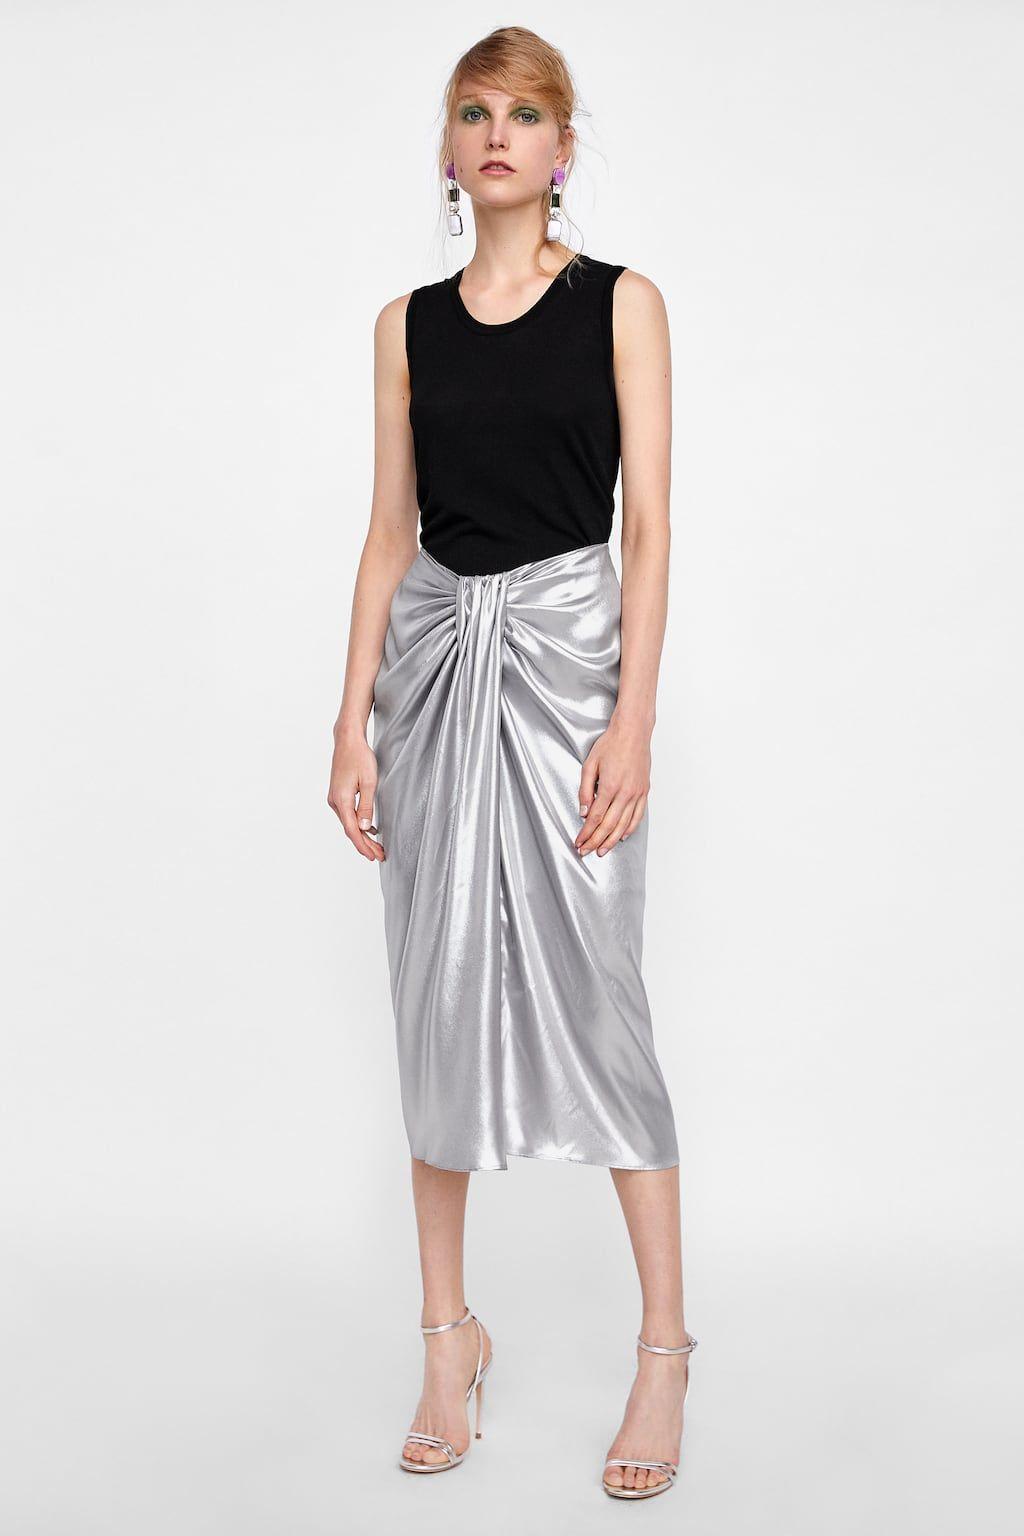 Image 1 De Jupe Drapee Effet Metallise De Zara Draped Skirt Eve Outfit Skirts